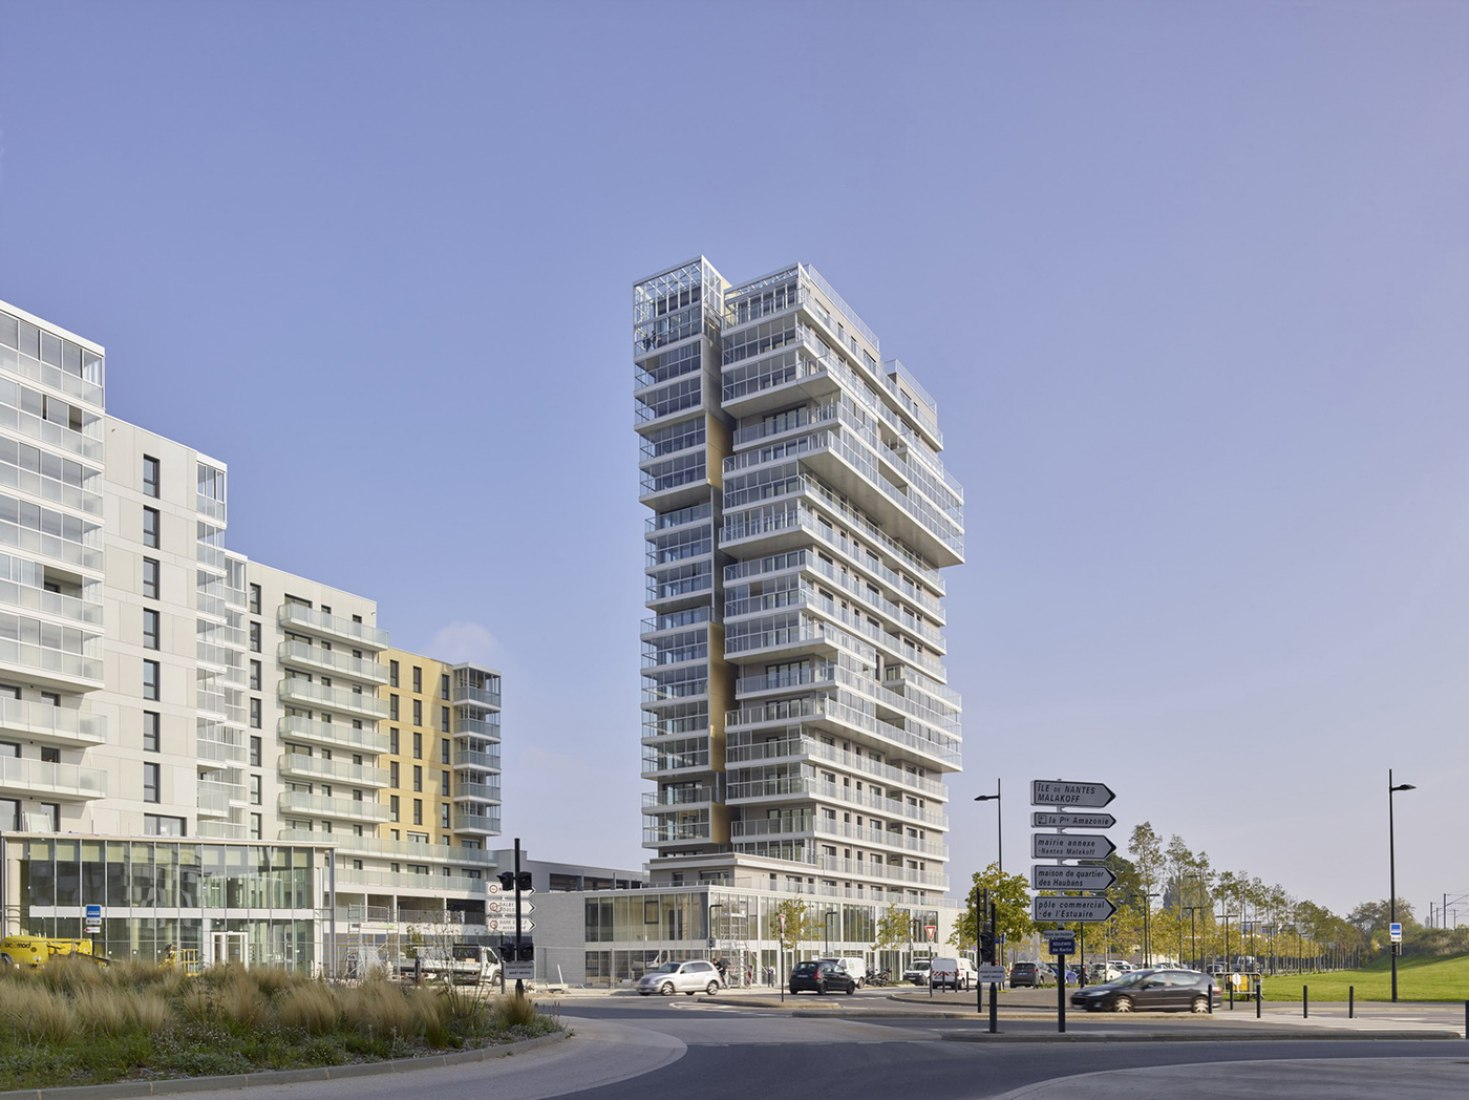 151 viviendas en ZAC du Pré Gauchet por a/LTA. Fotografía © S. Chalmeau